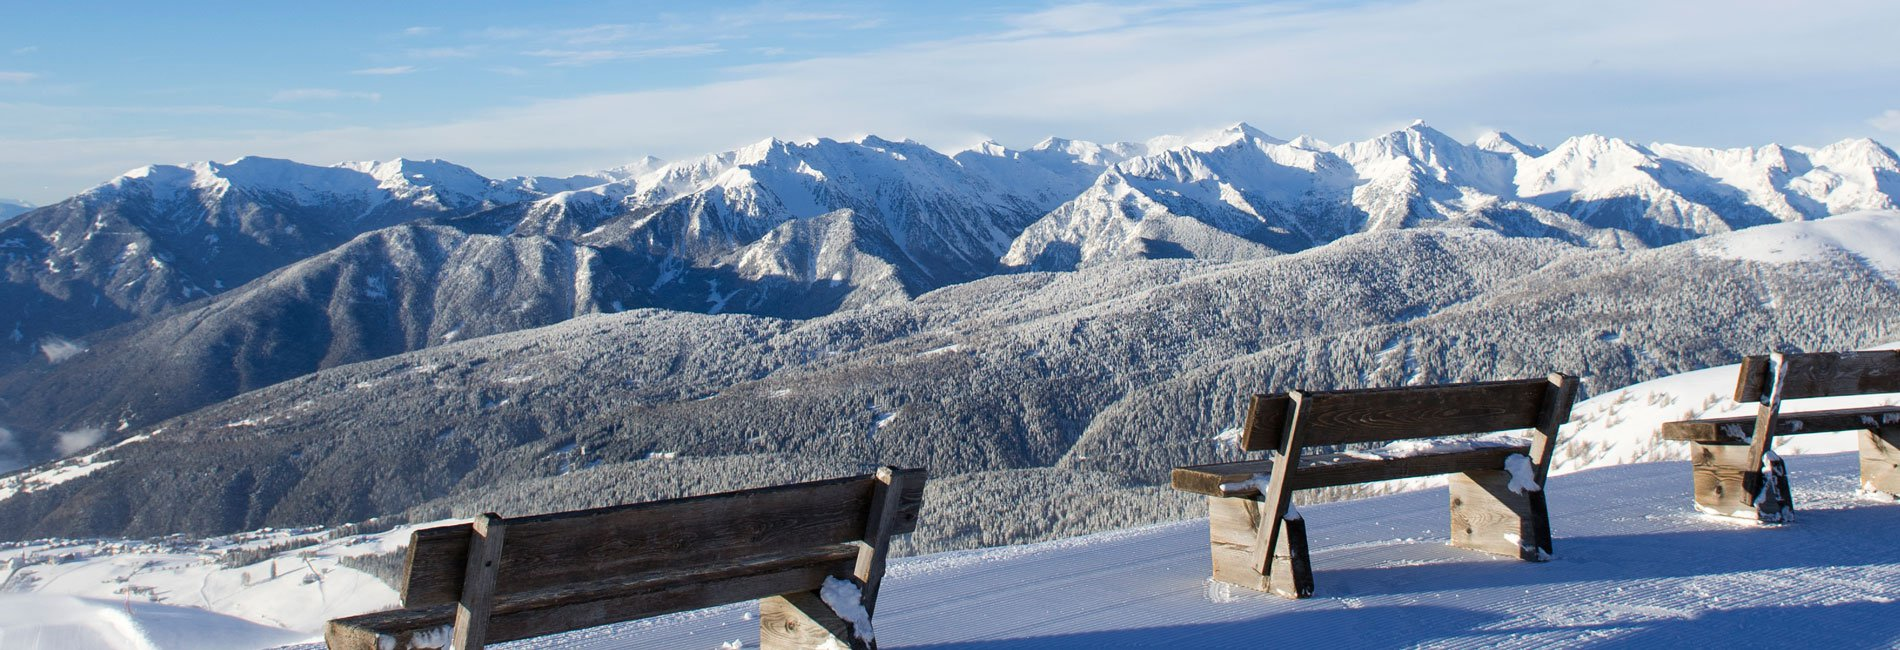 skiurlaub-meransen-31